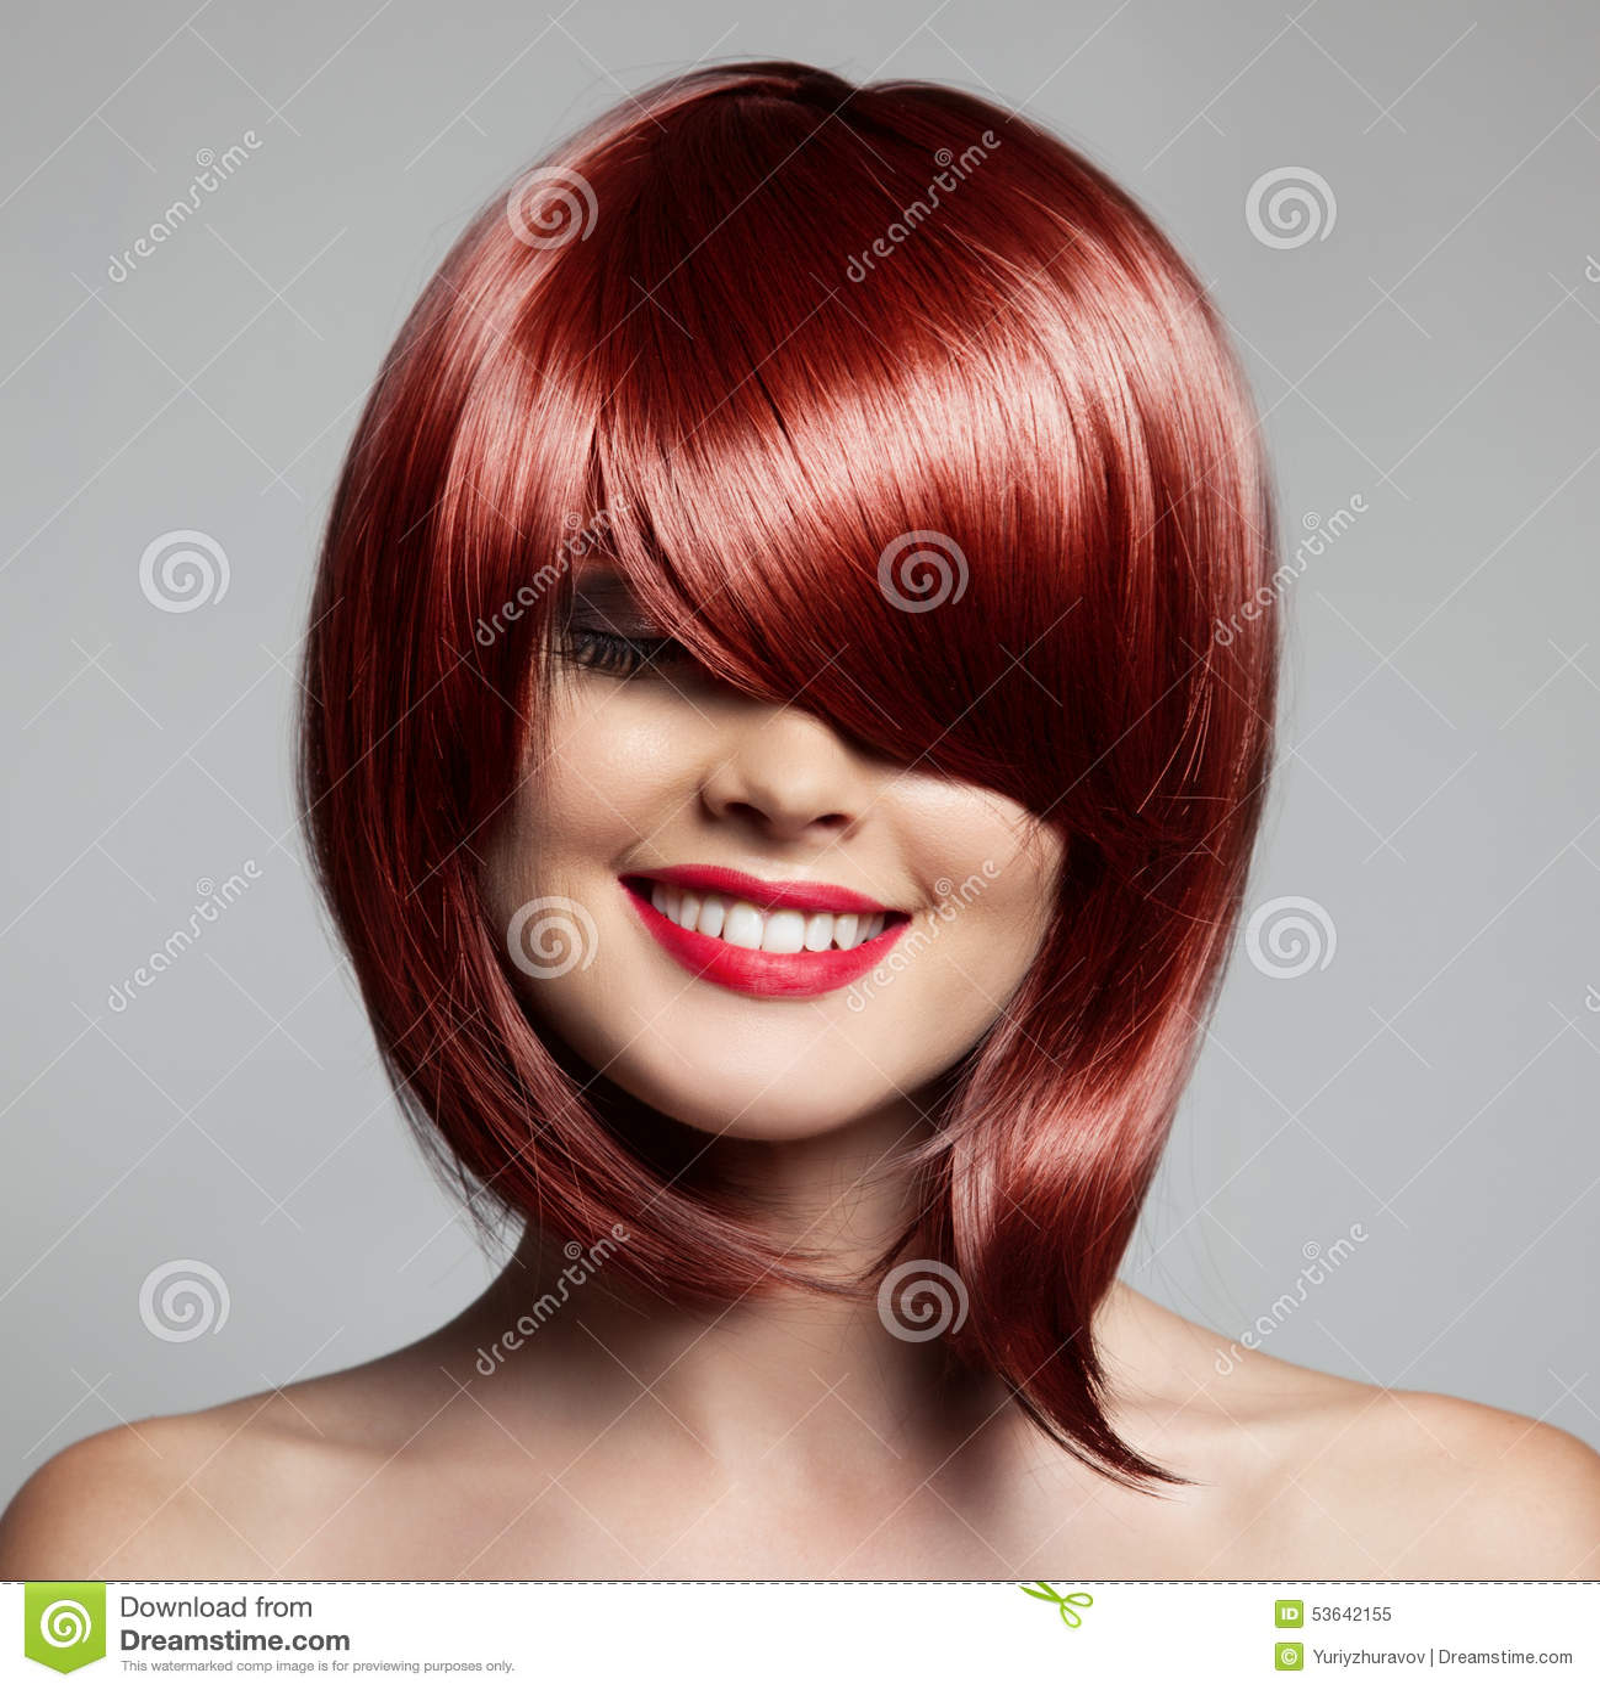 Mulher bonita de sorriso com cabelo curto vermelho haircut hairstyle